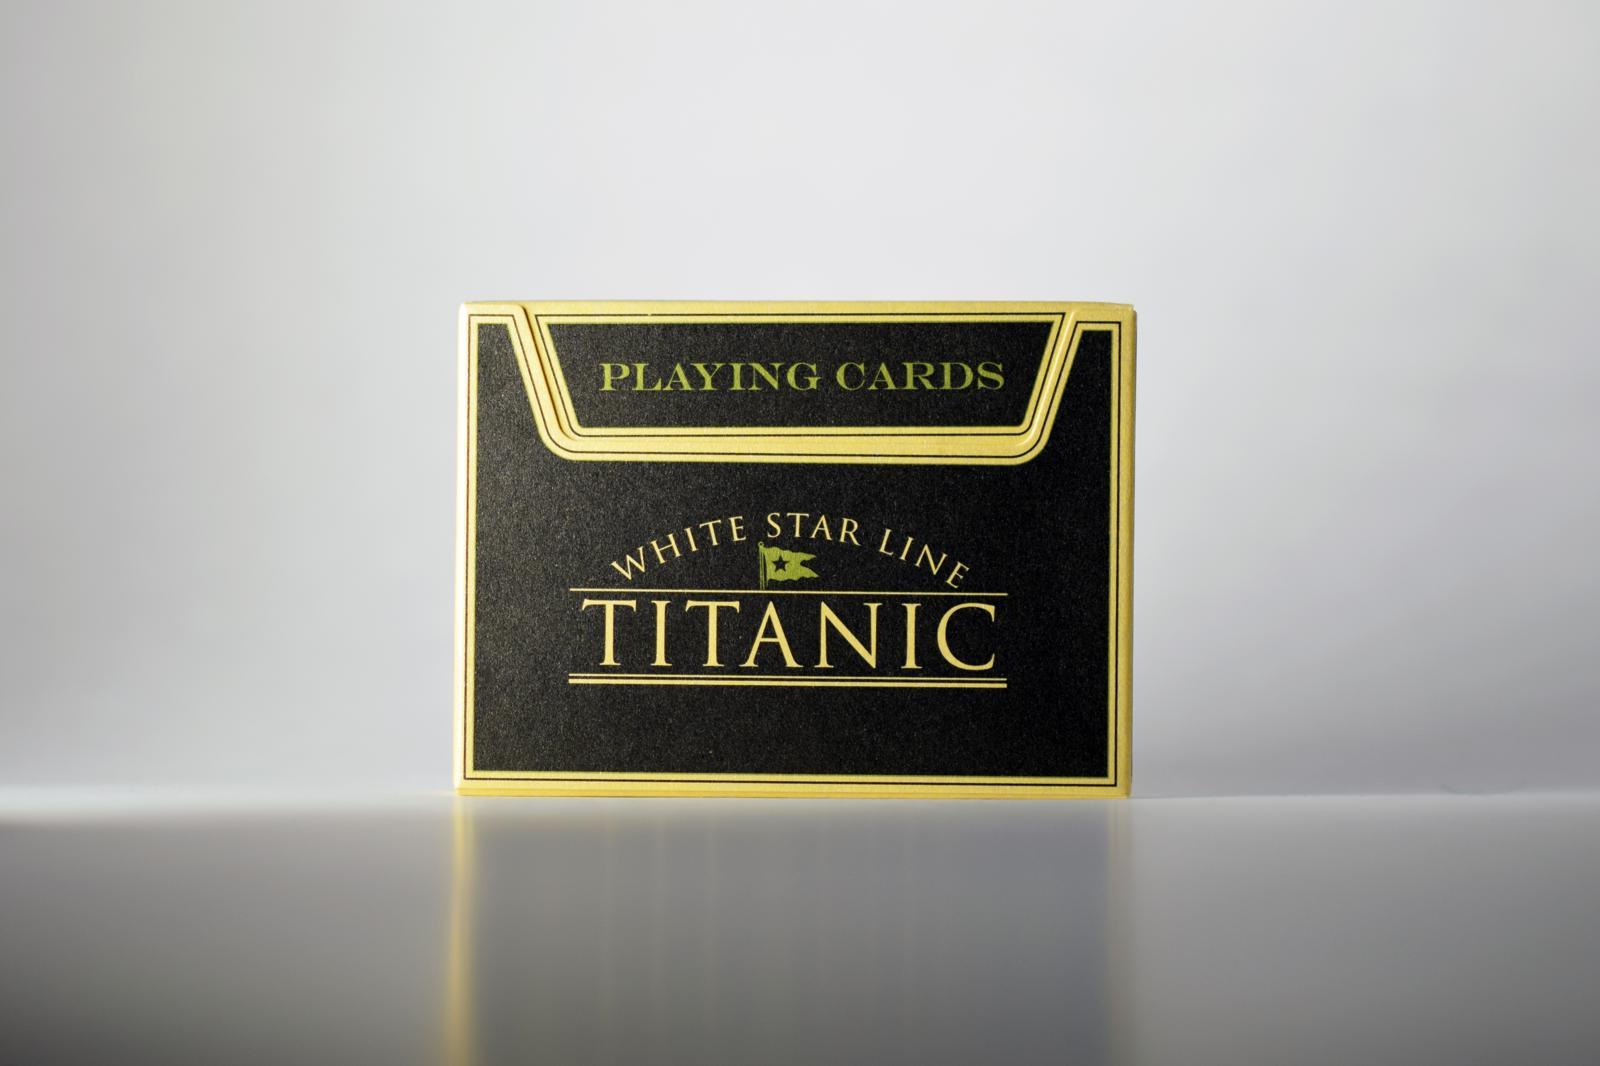 TitanicFront